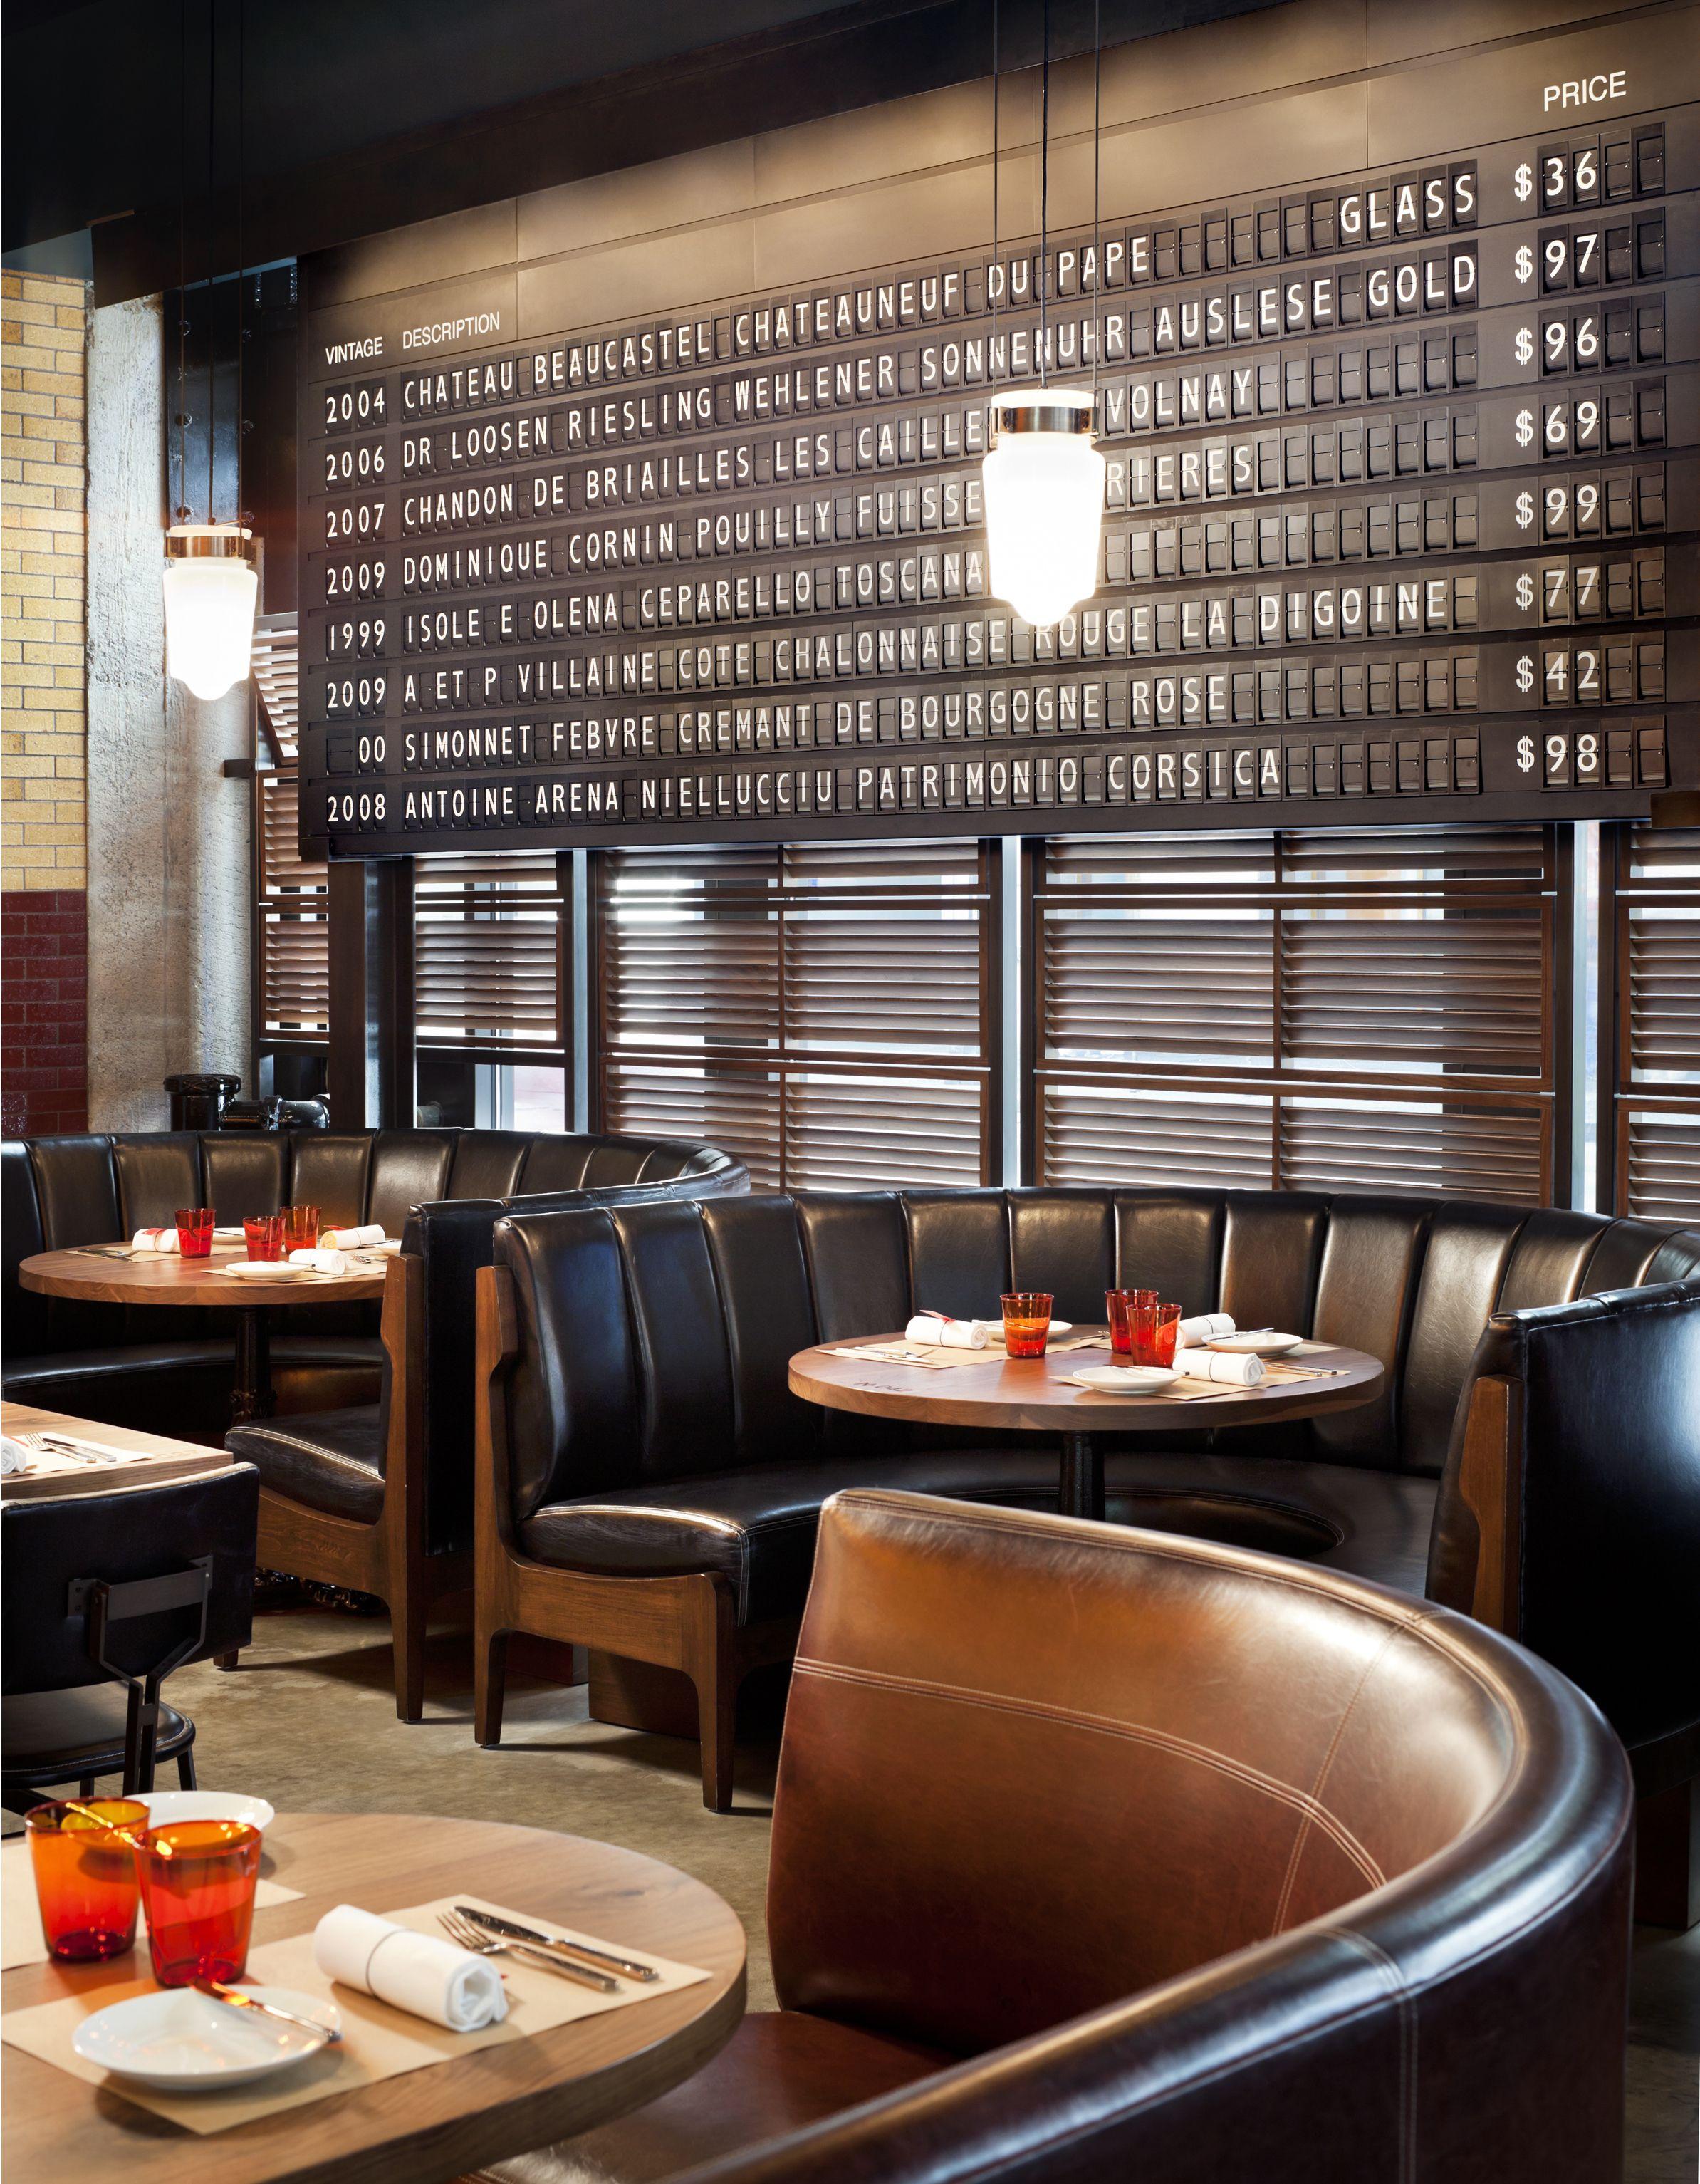 Rn74 seattle brilliant menu design central melt - Restaurant interior design seattle ...